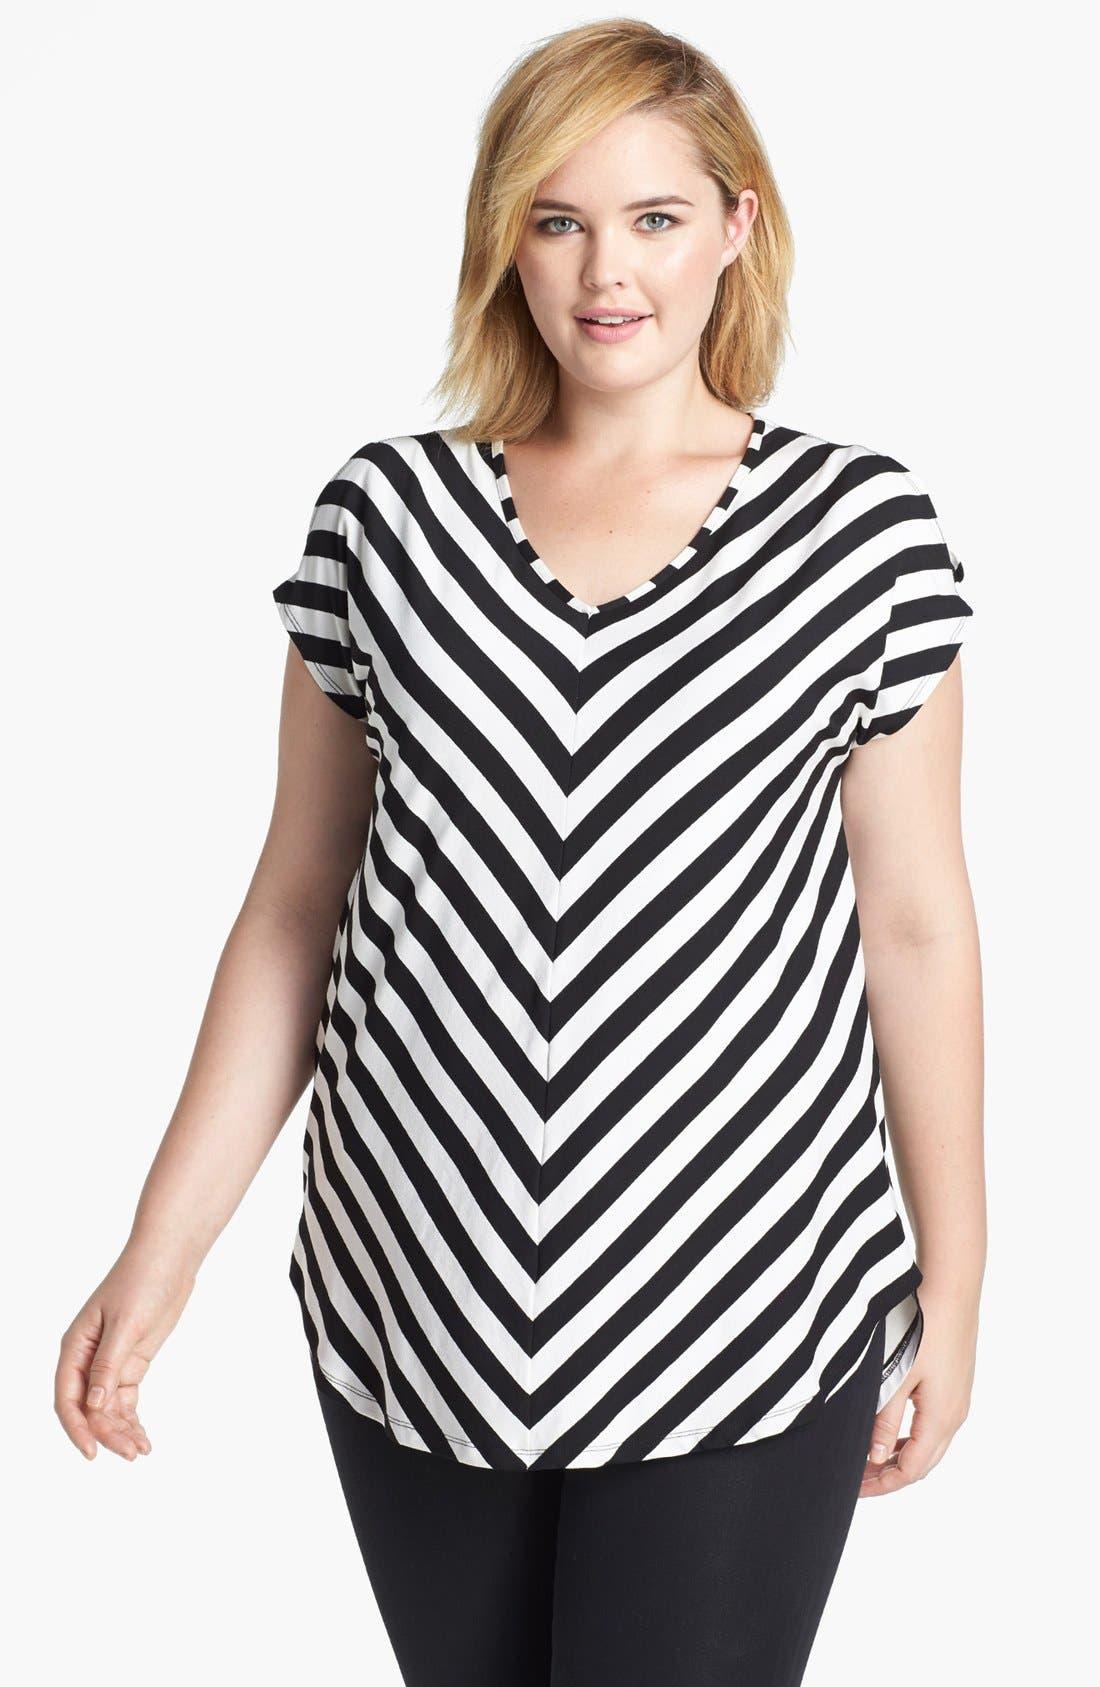 Alternate Image 1 Selected - Evans Chevron Stripe Top (Plus Size)